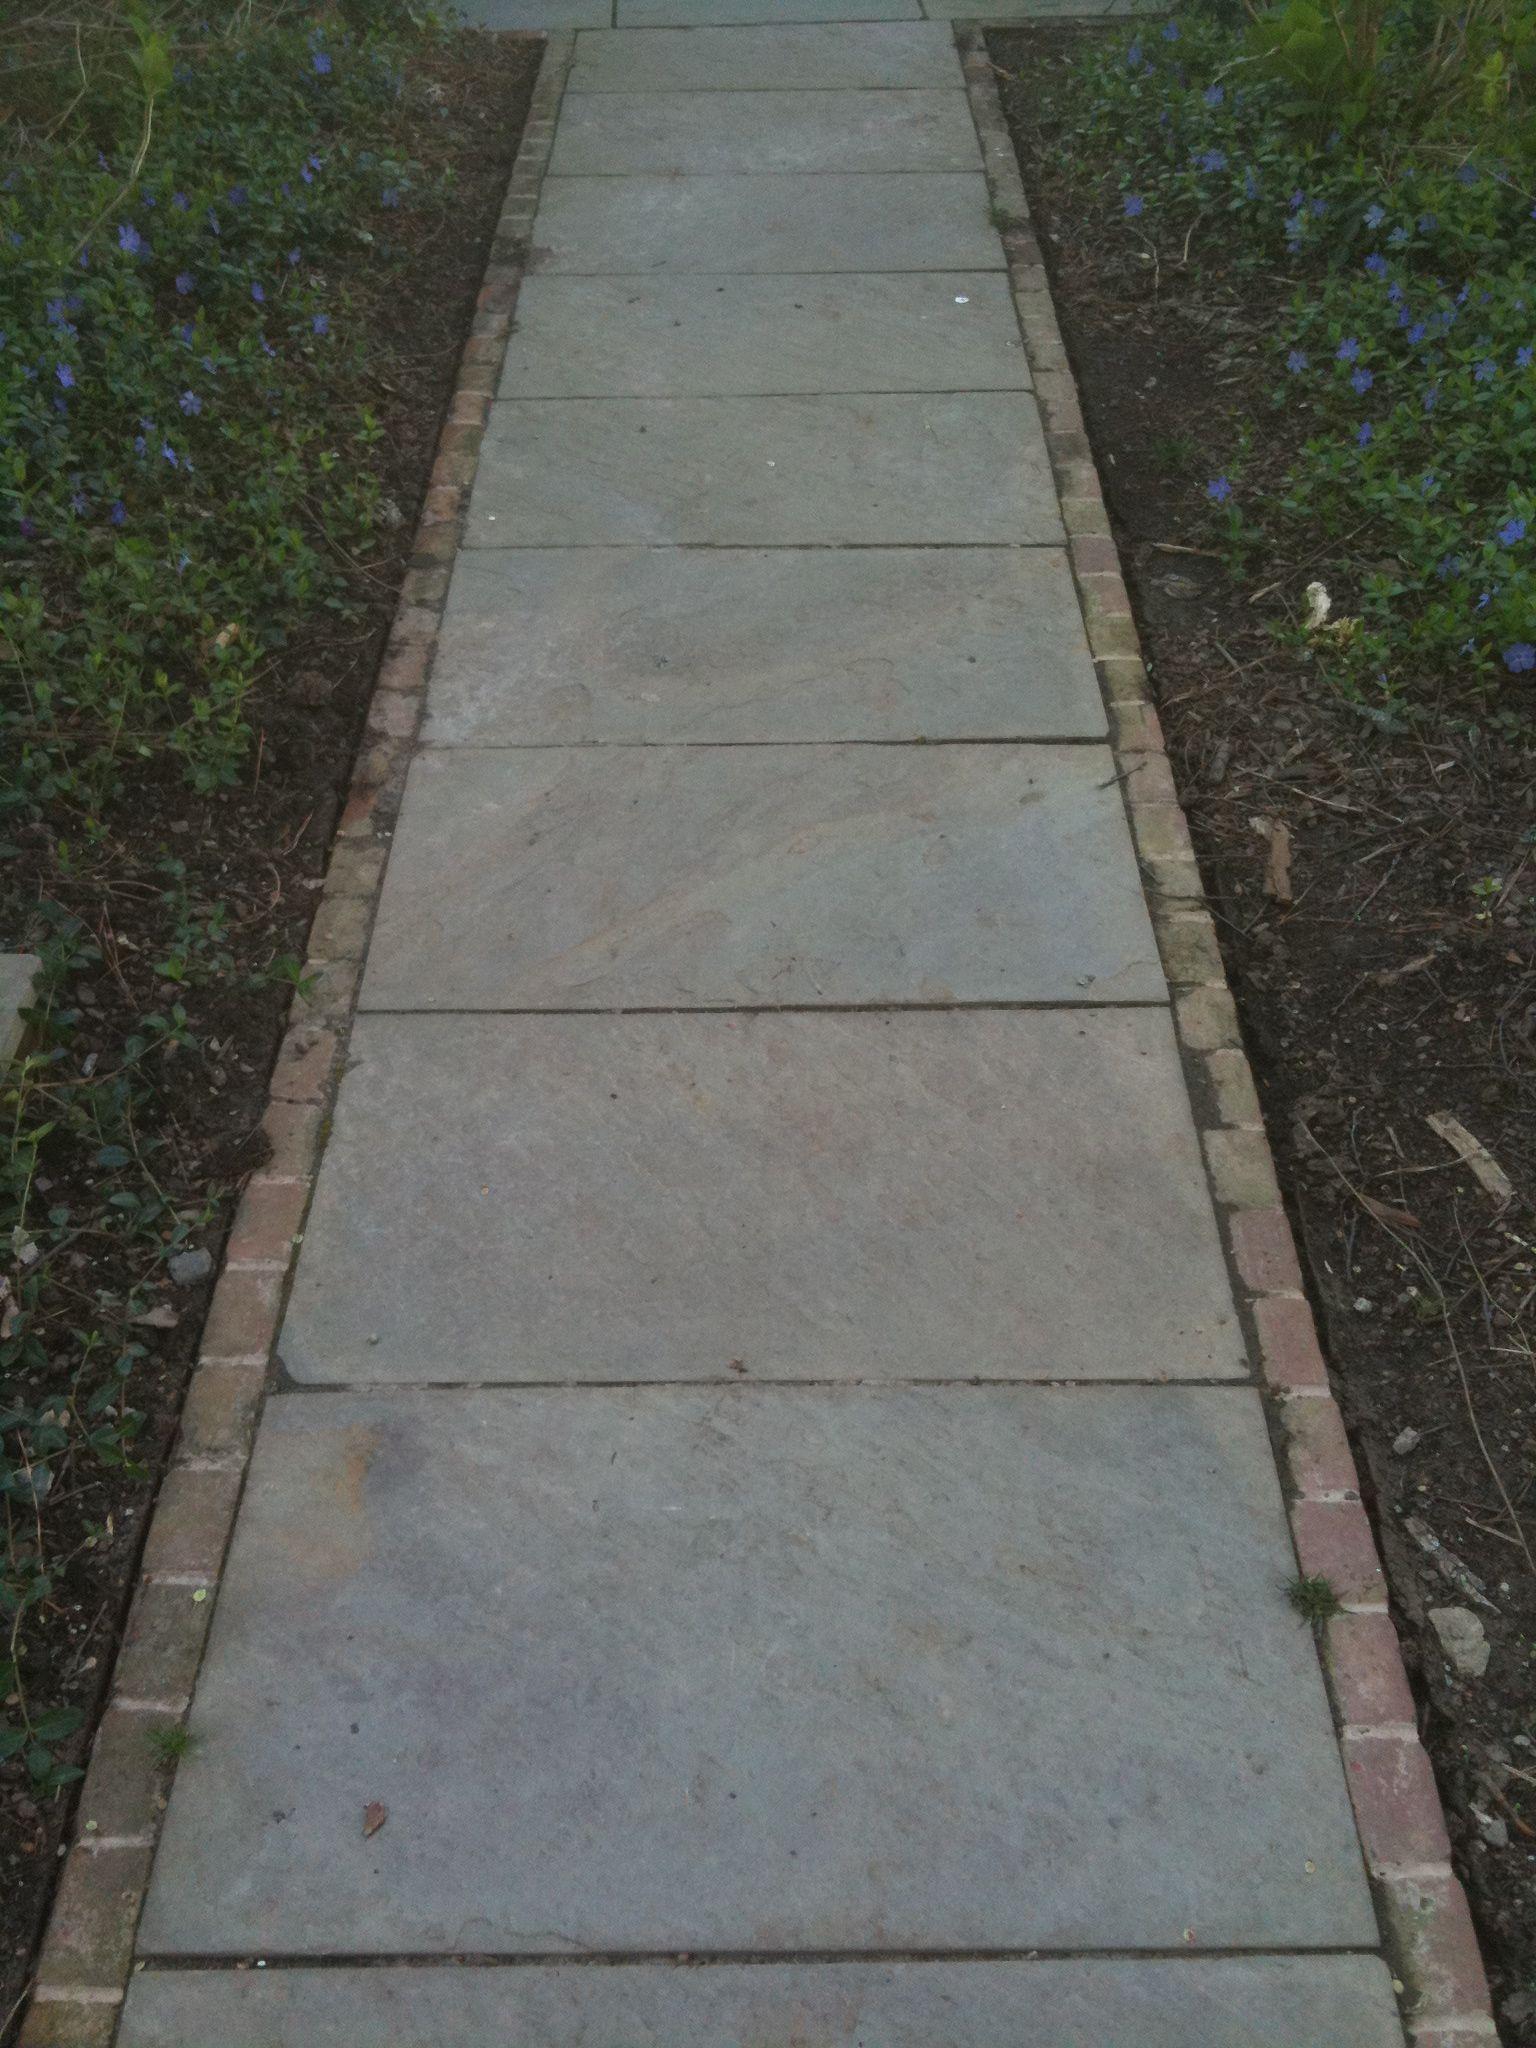 Bluestone With Brick Edge In Sailor Pattern Walkways In